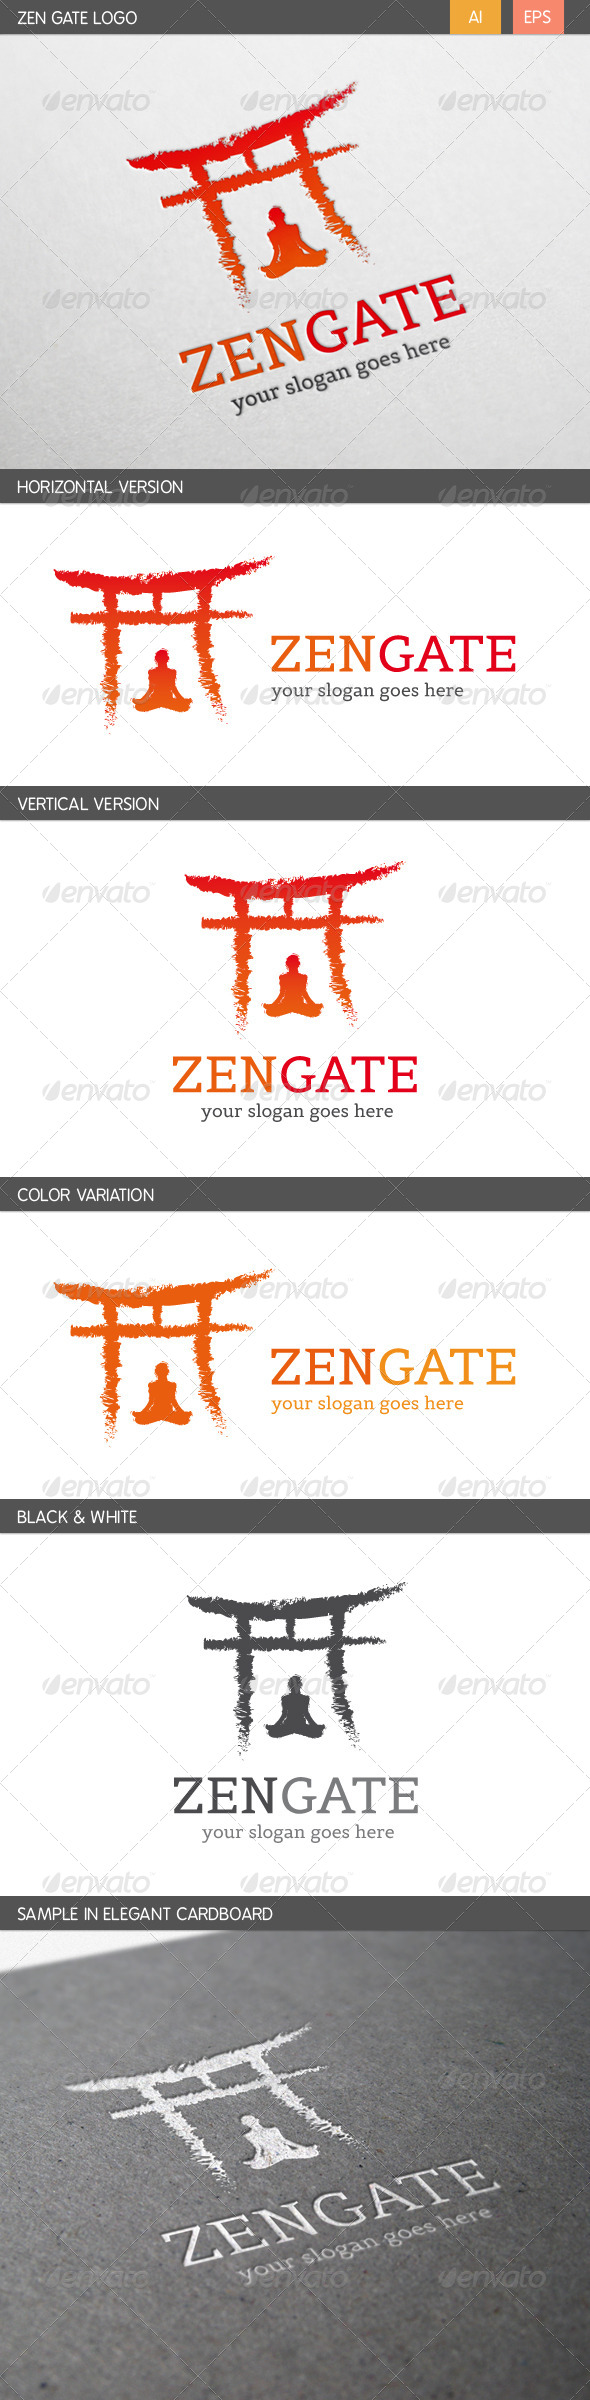 GraphicRiver Zen Gate Logo 5935180